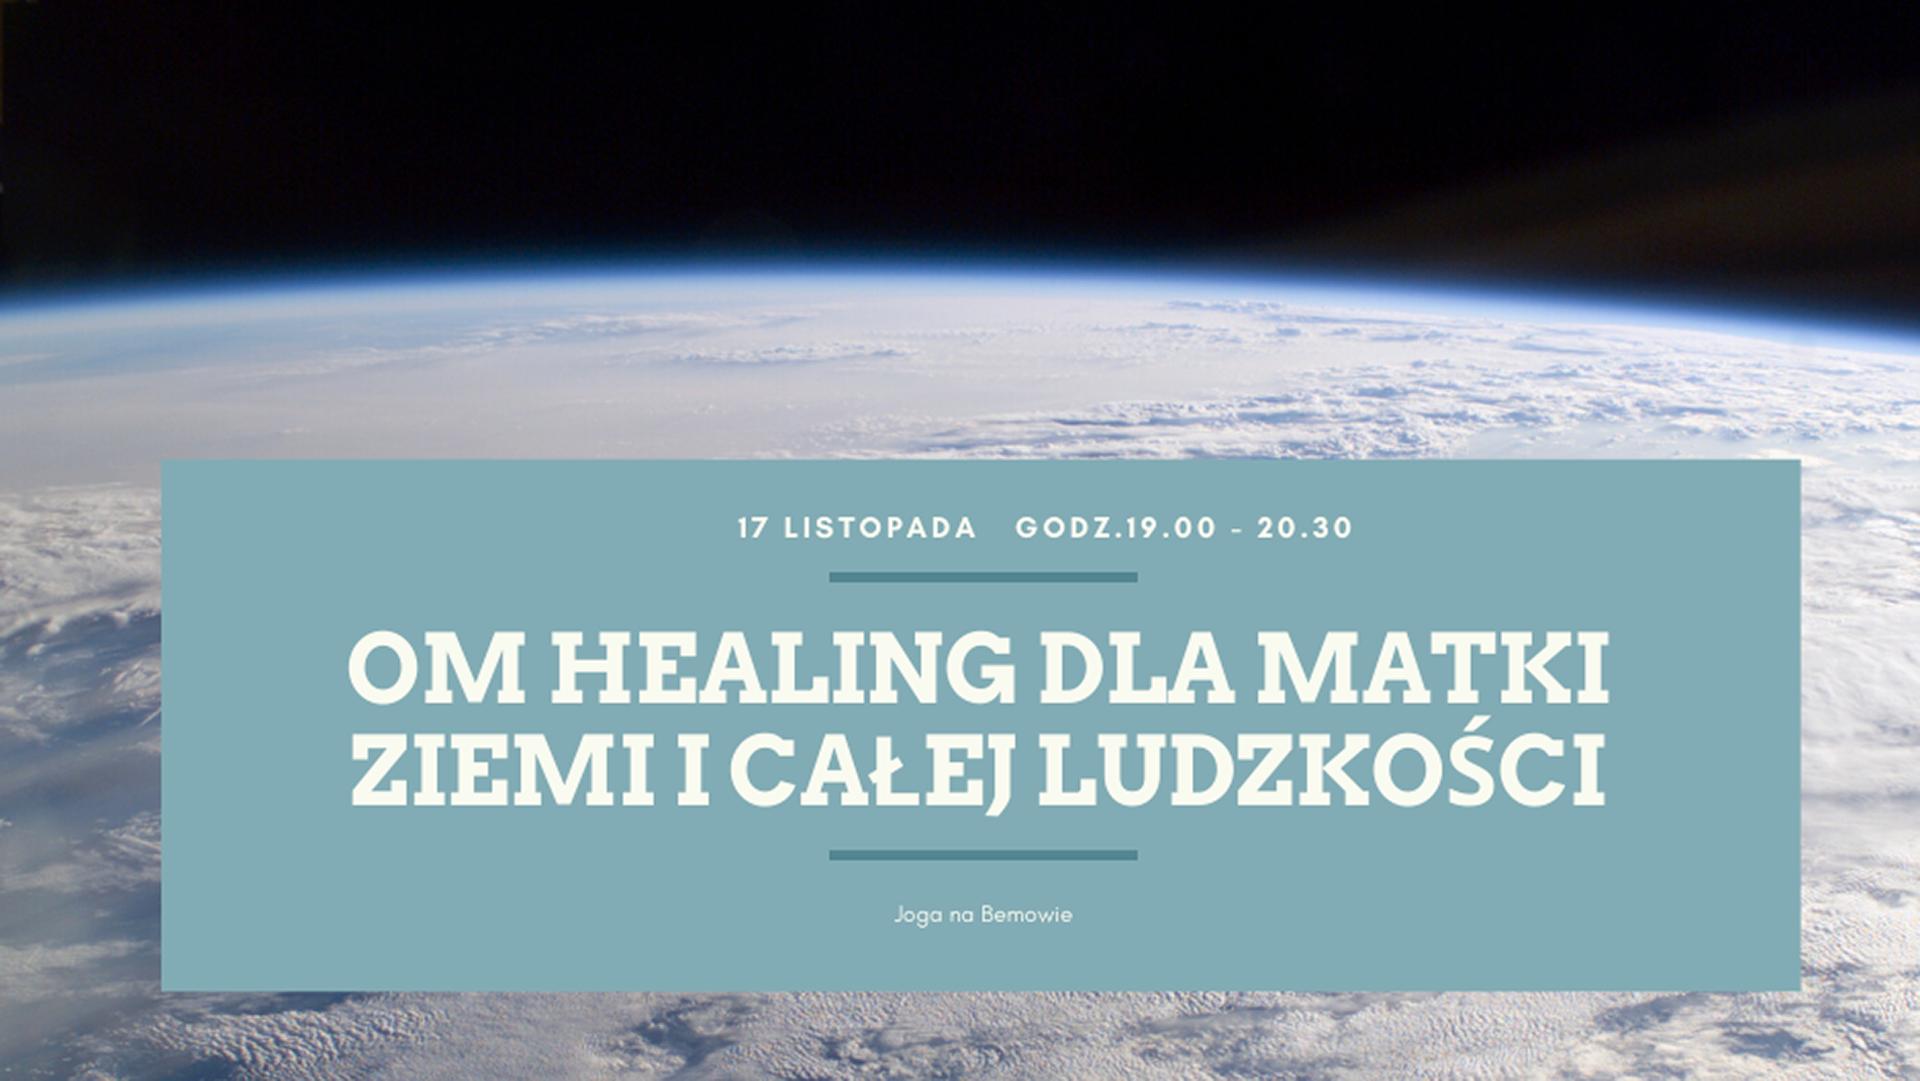 om healing